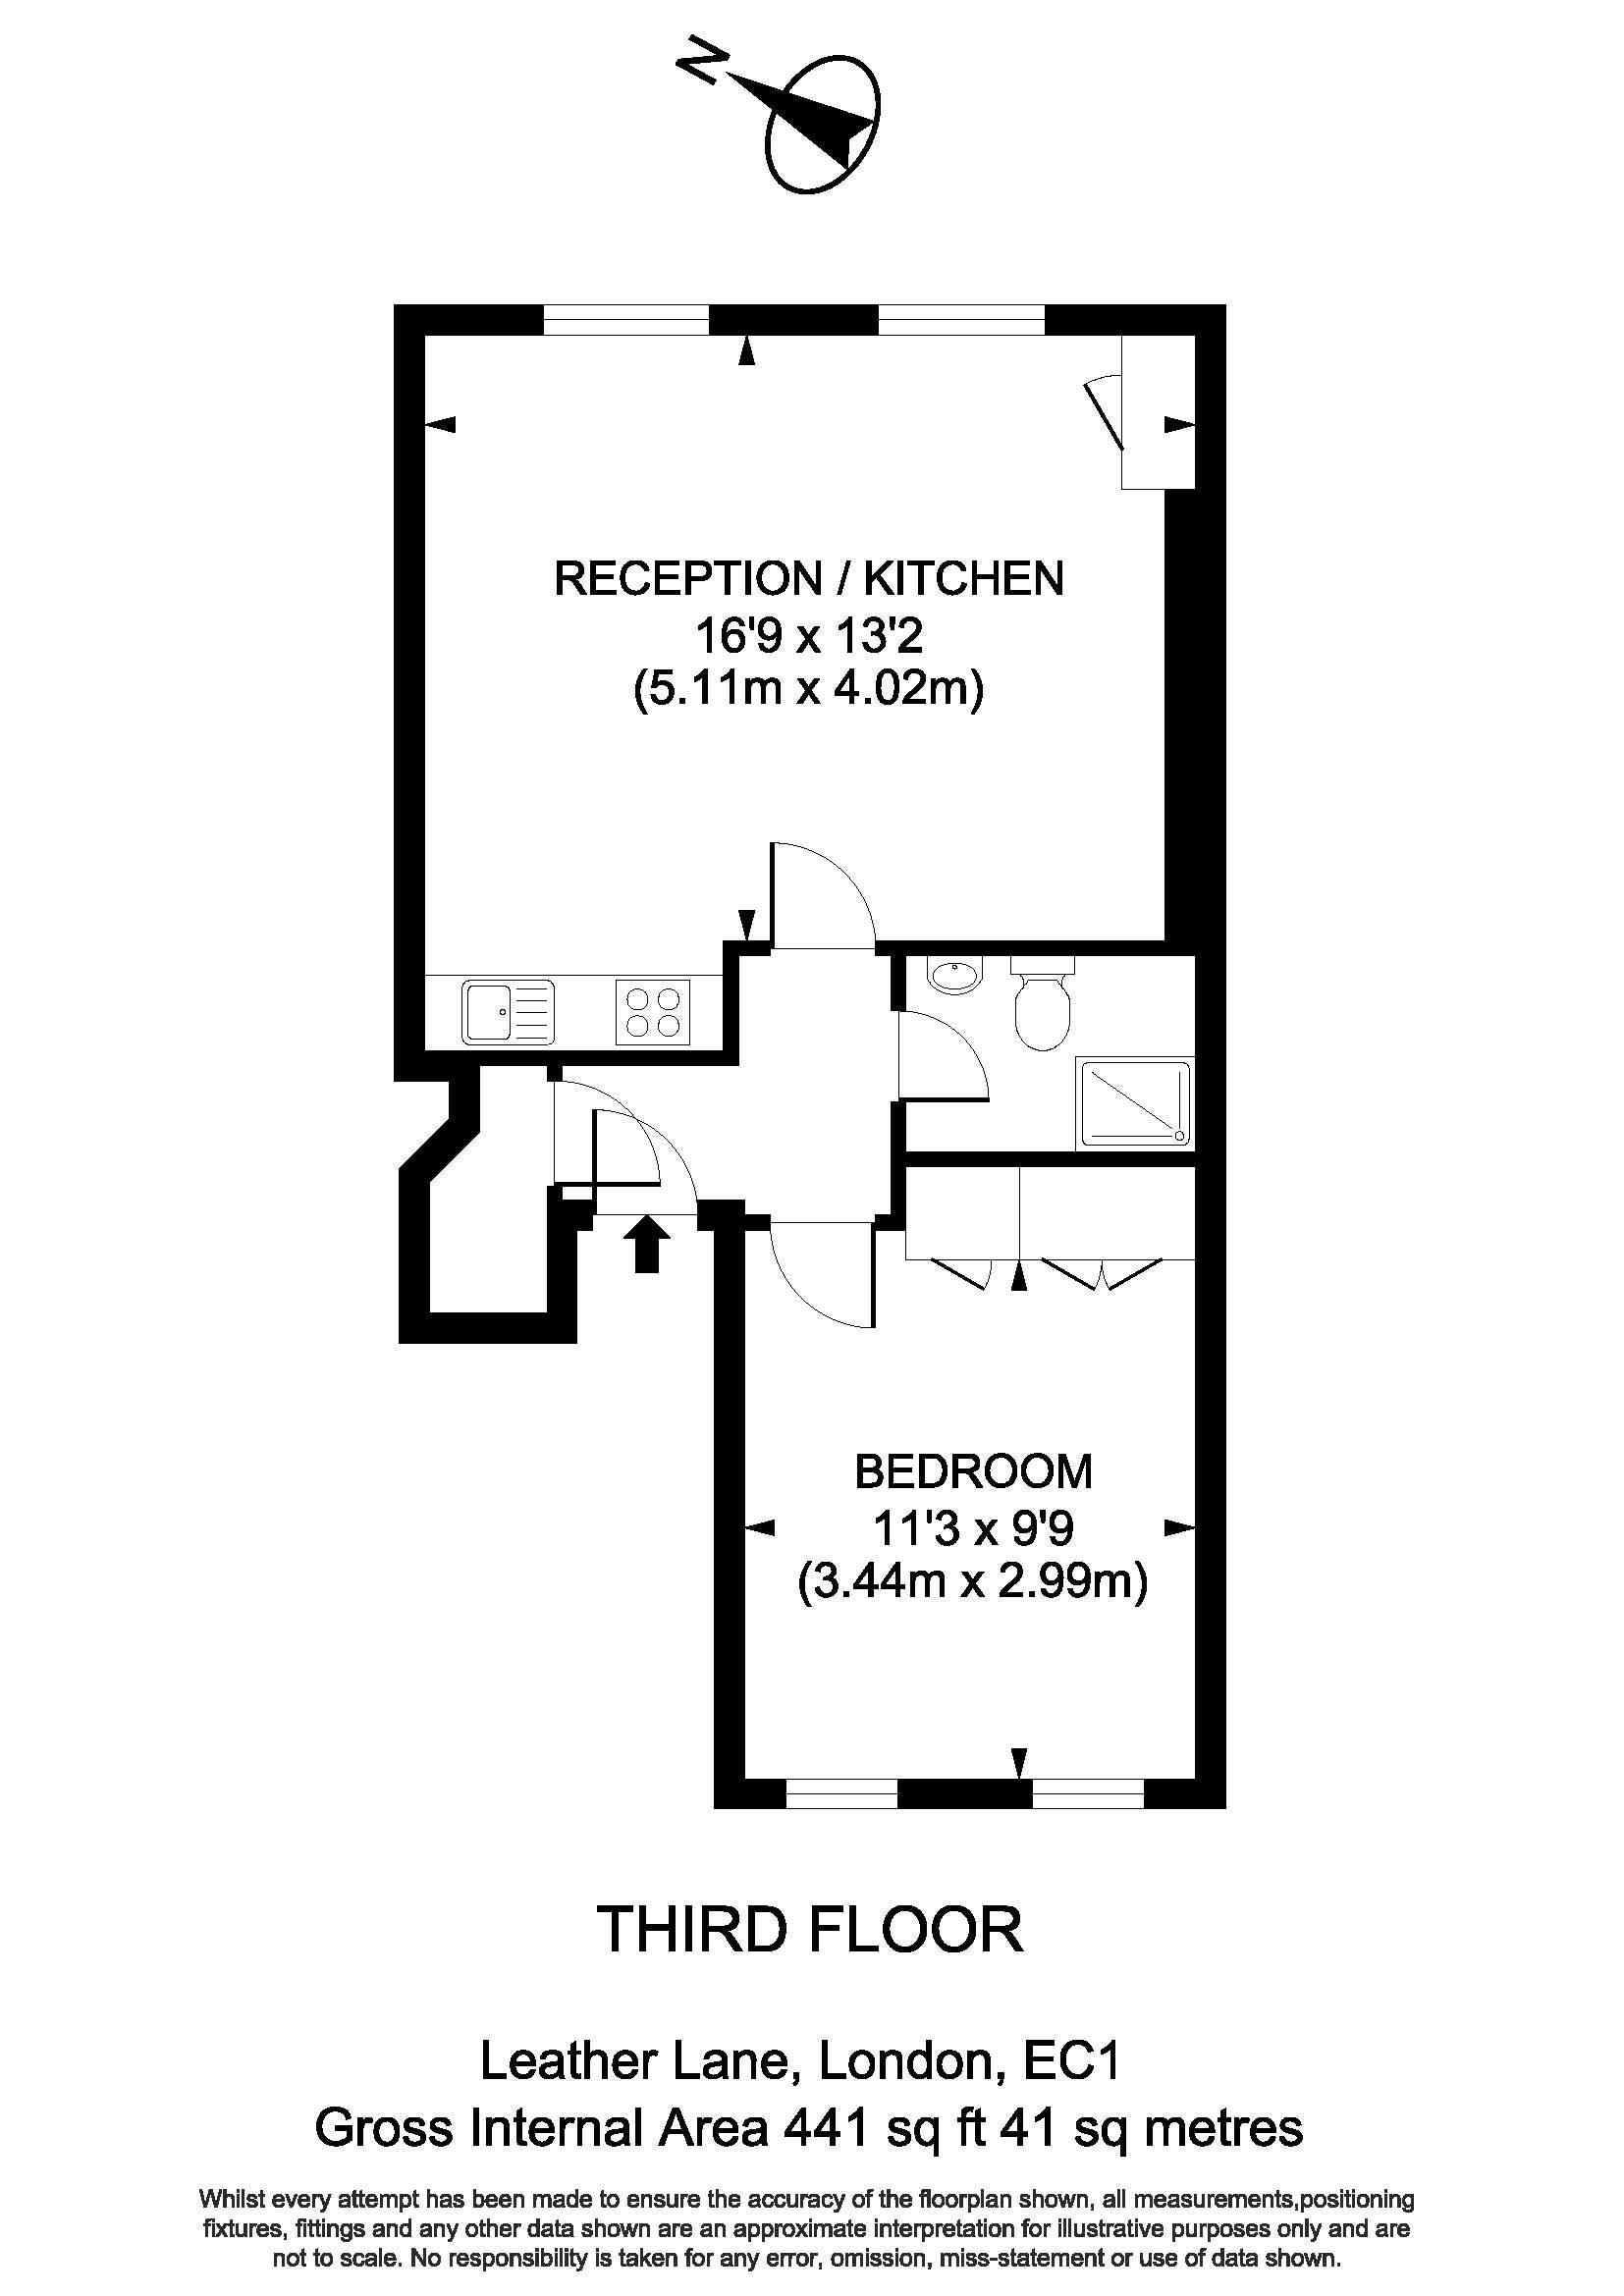 89C Leather Lane - Floorplan